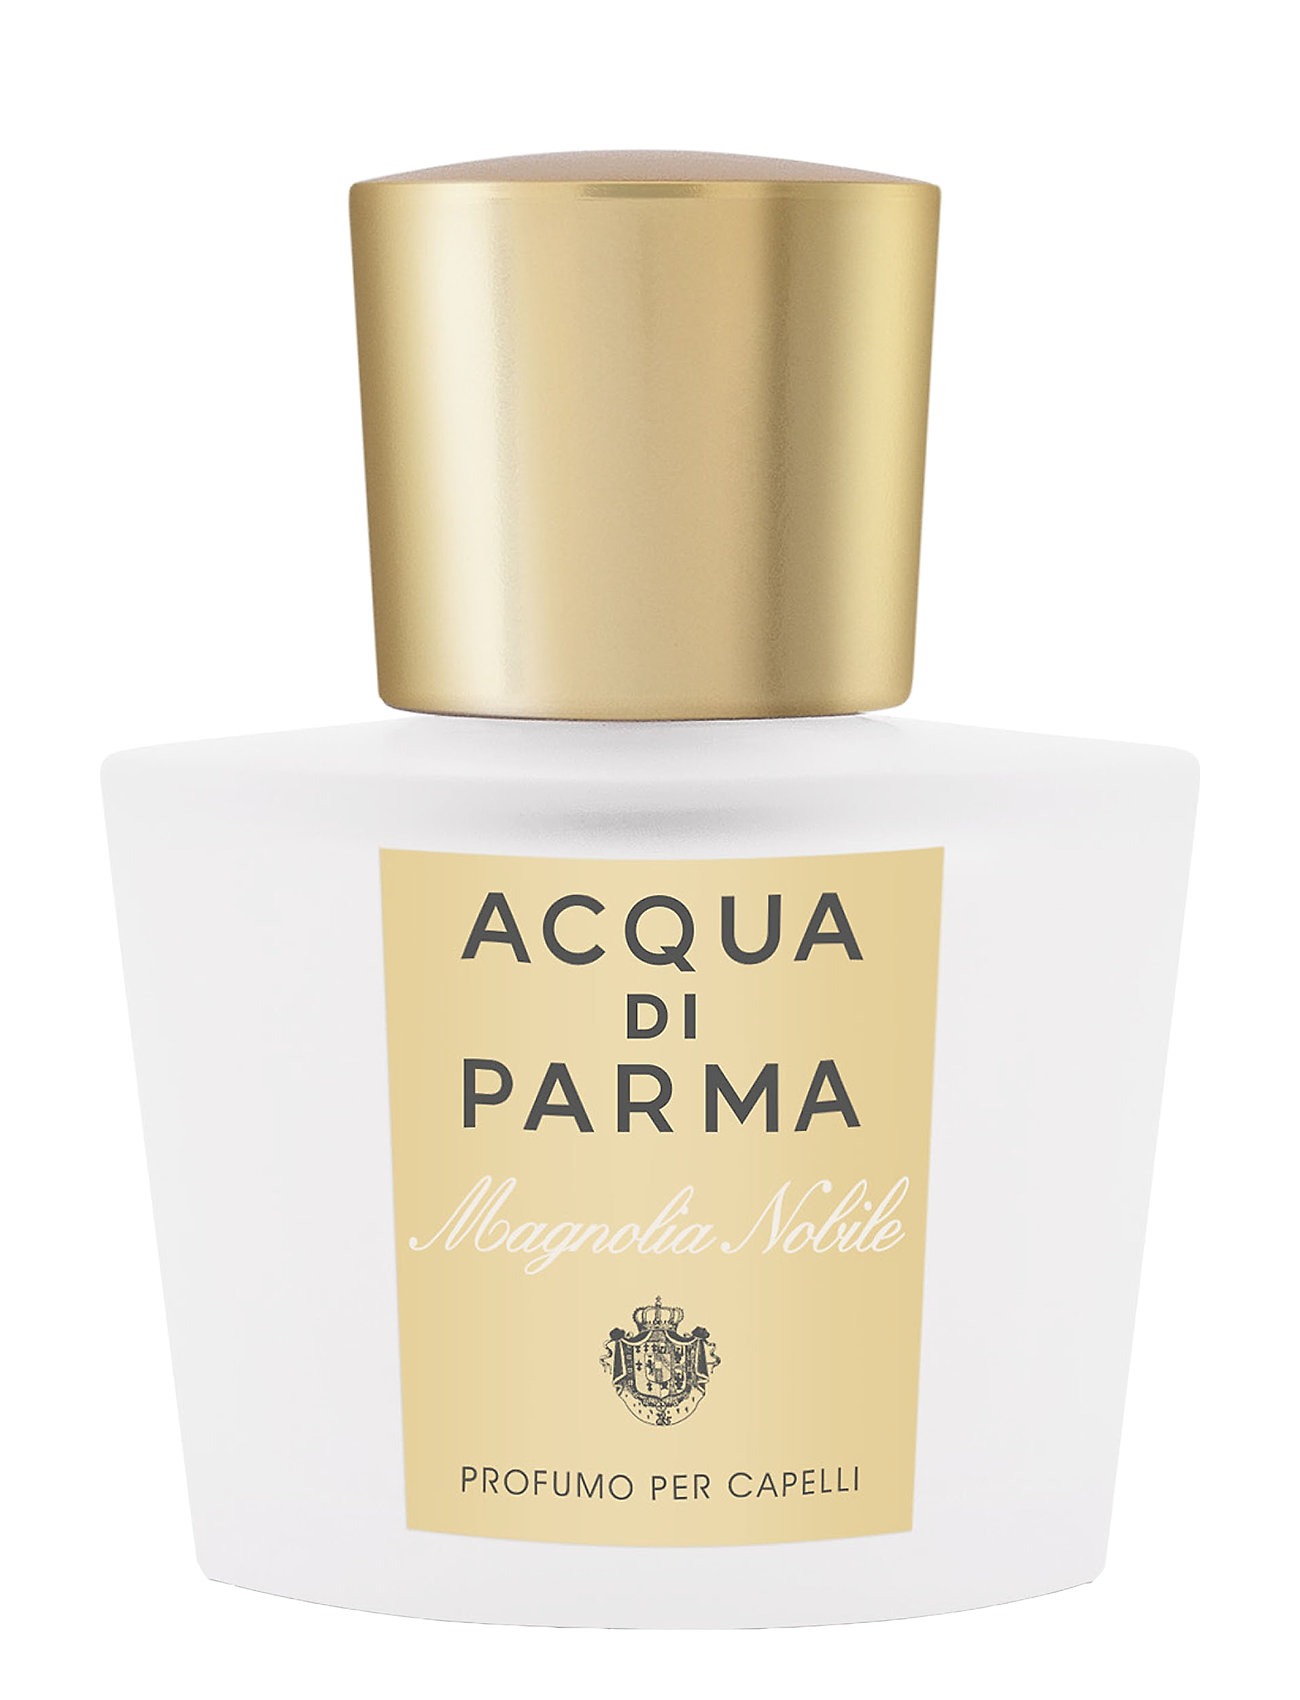 Image of Magnolia Nobile Hair Mist Beauty WOMEN Hair Perfume Mists Nude Acqua Di Parma (3325703797)